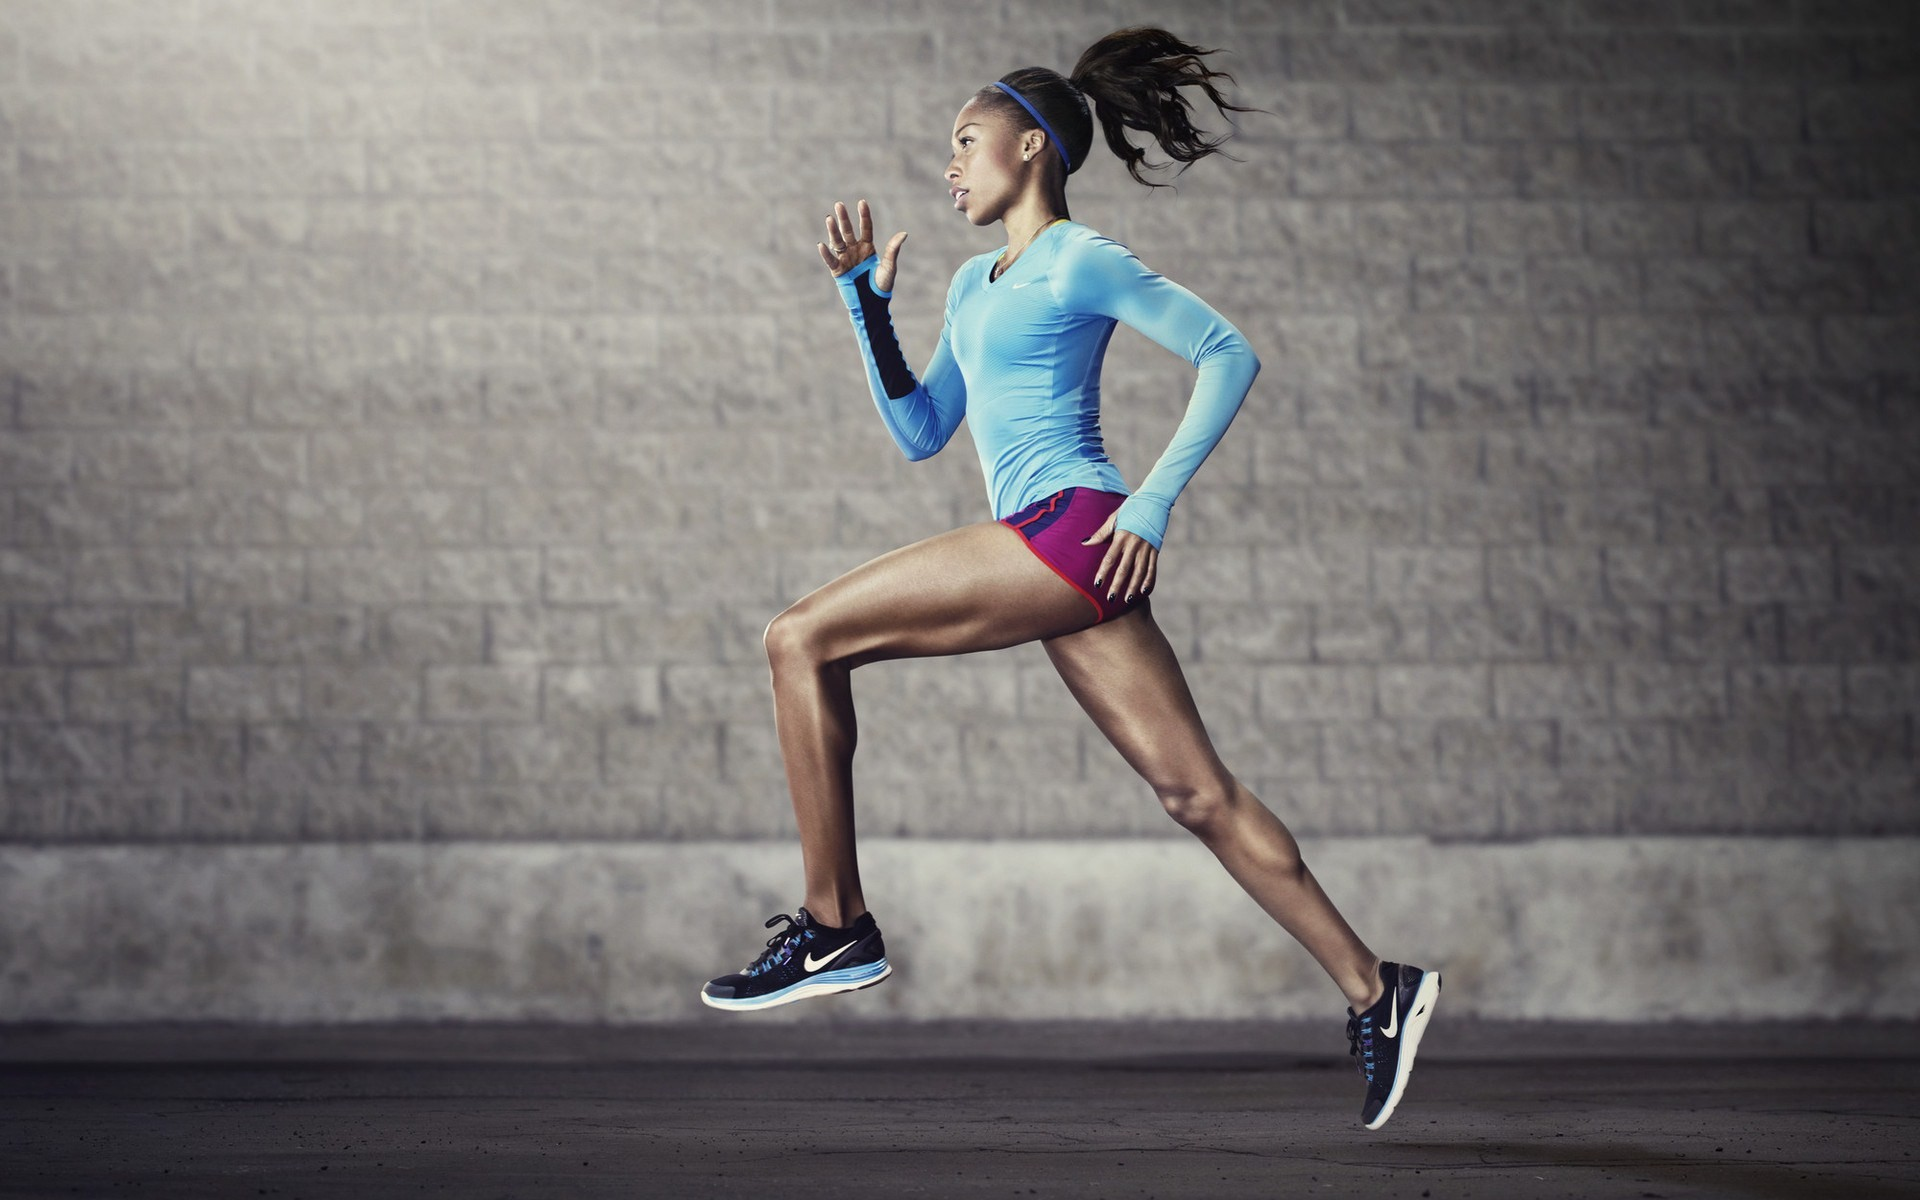 Girl-Nike-Running-HD-Wallpaper | FYI